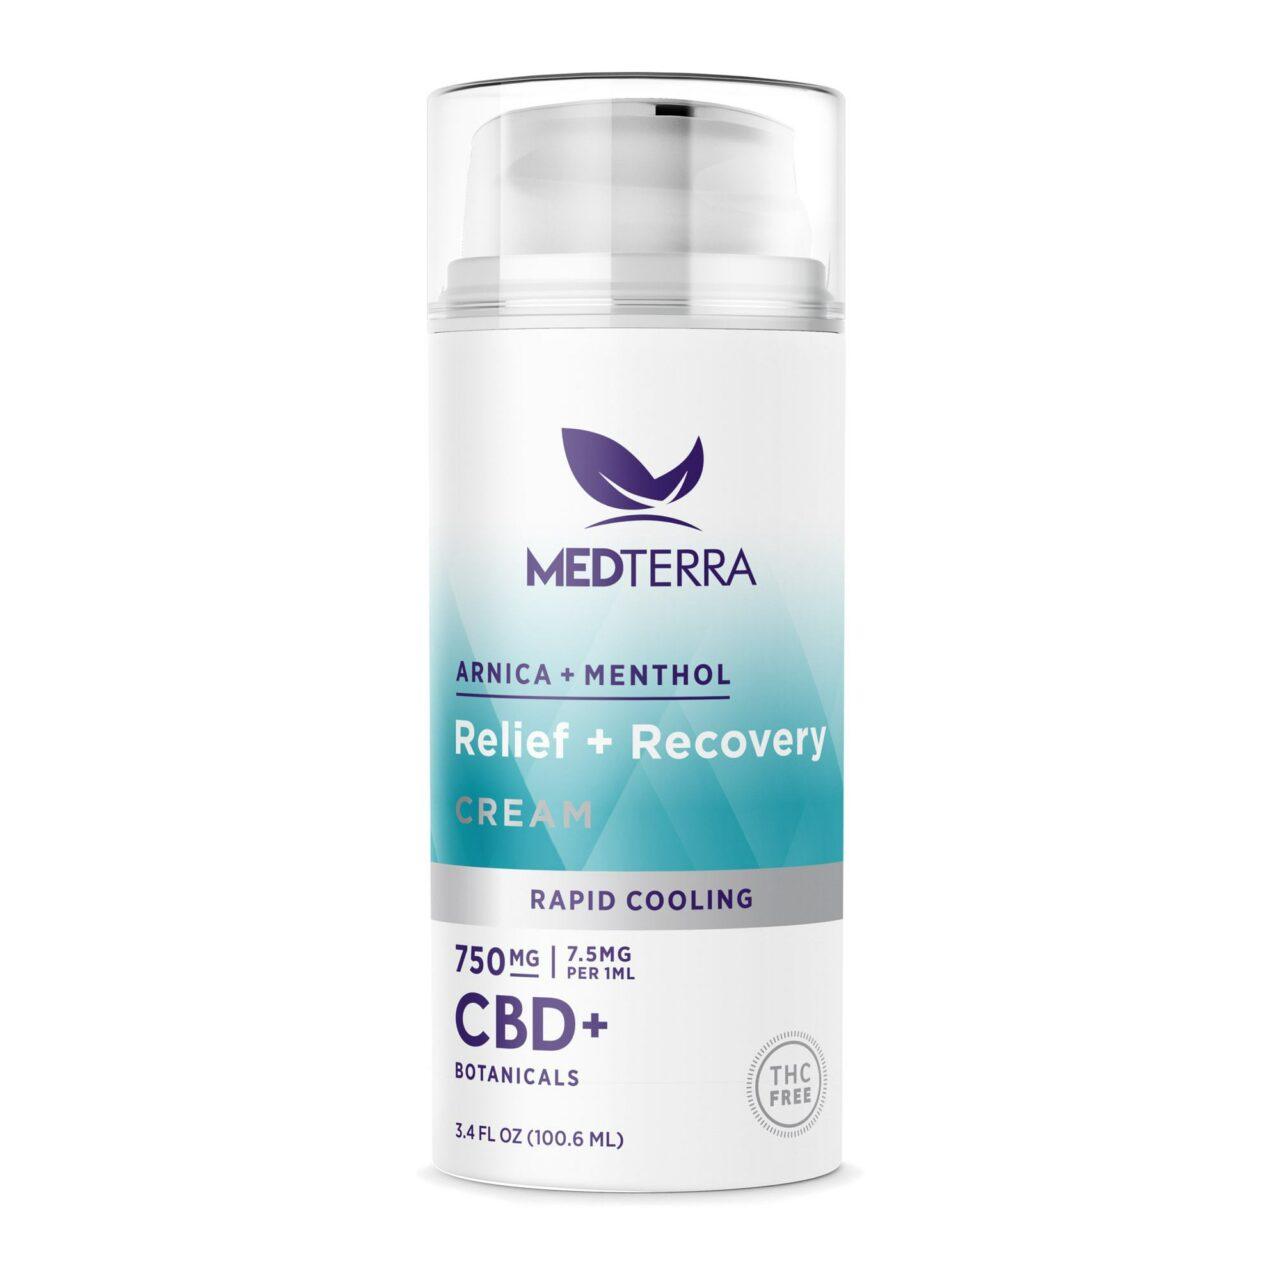 Medterra, Relief + Recovery CBD Cream, Isolate THC-Free, 3.4oz, 750mg CBD 1